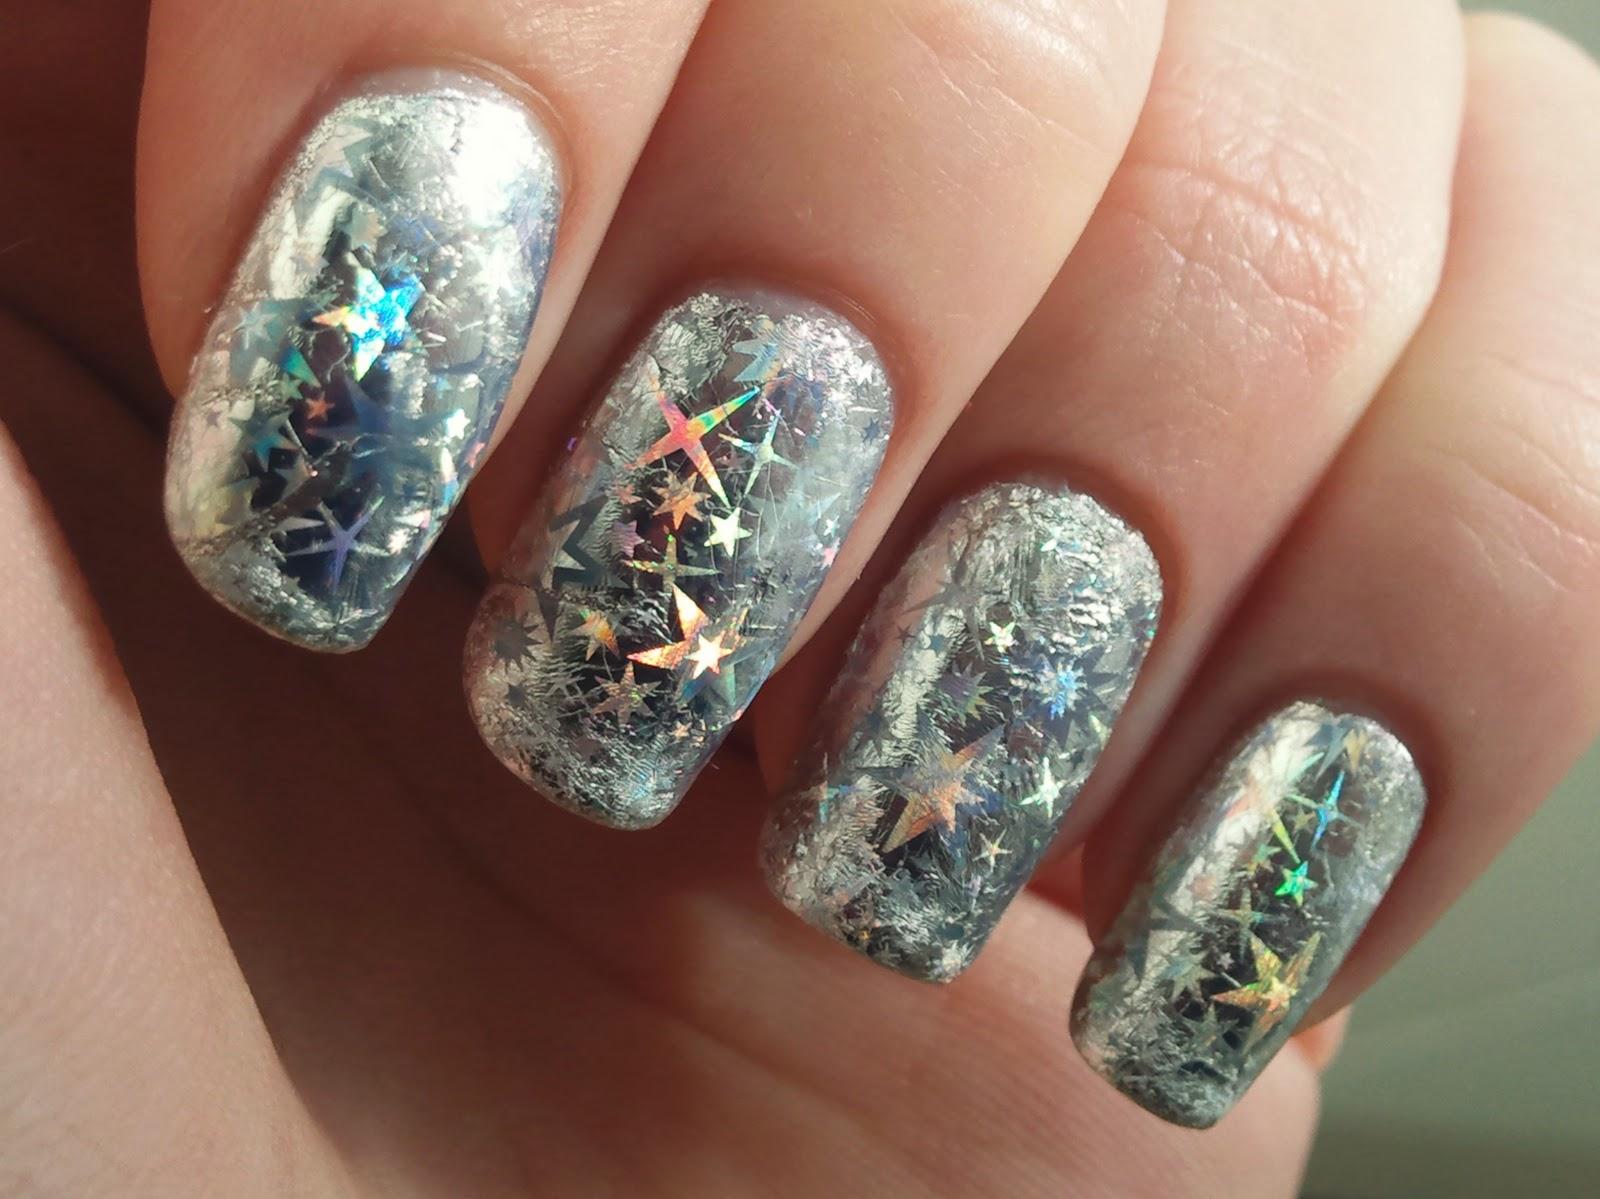 Spektor's Nails: Nail Art Foil: Silver Starburst